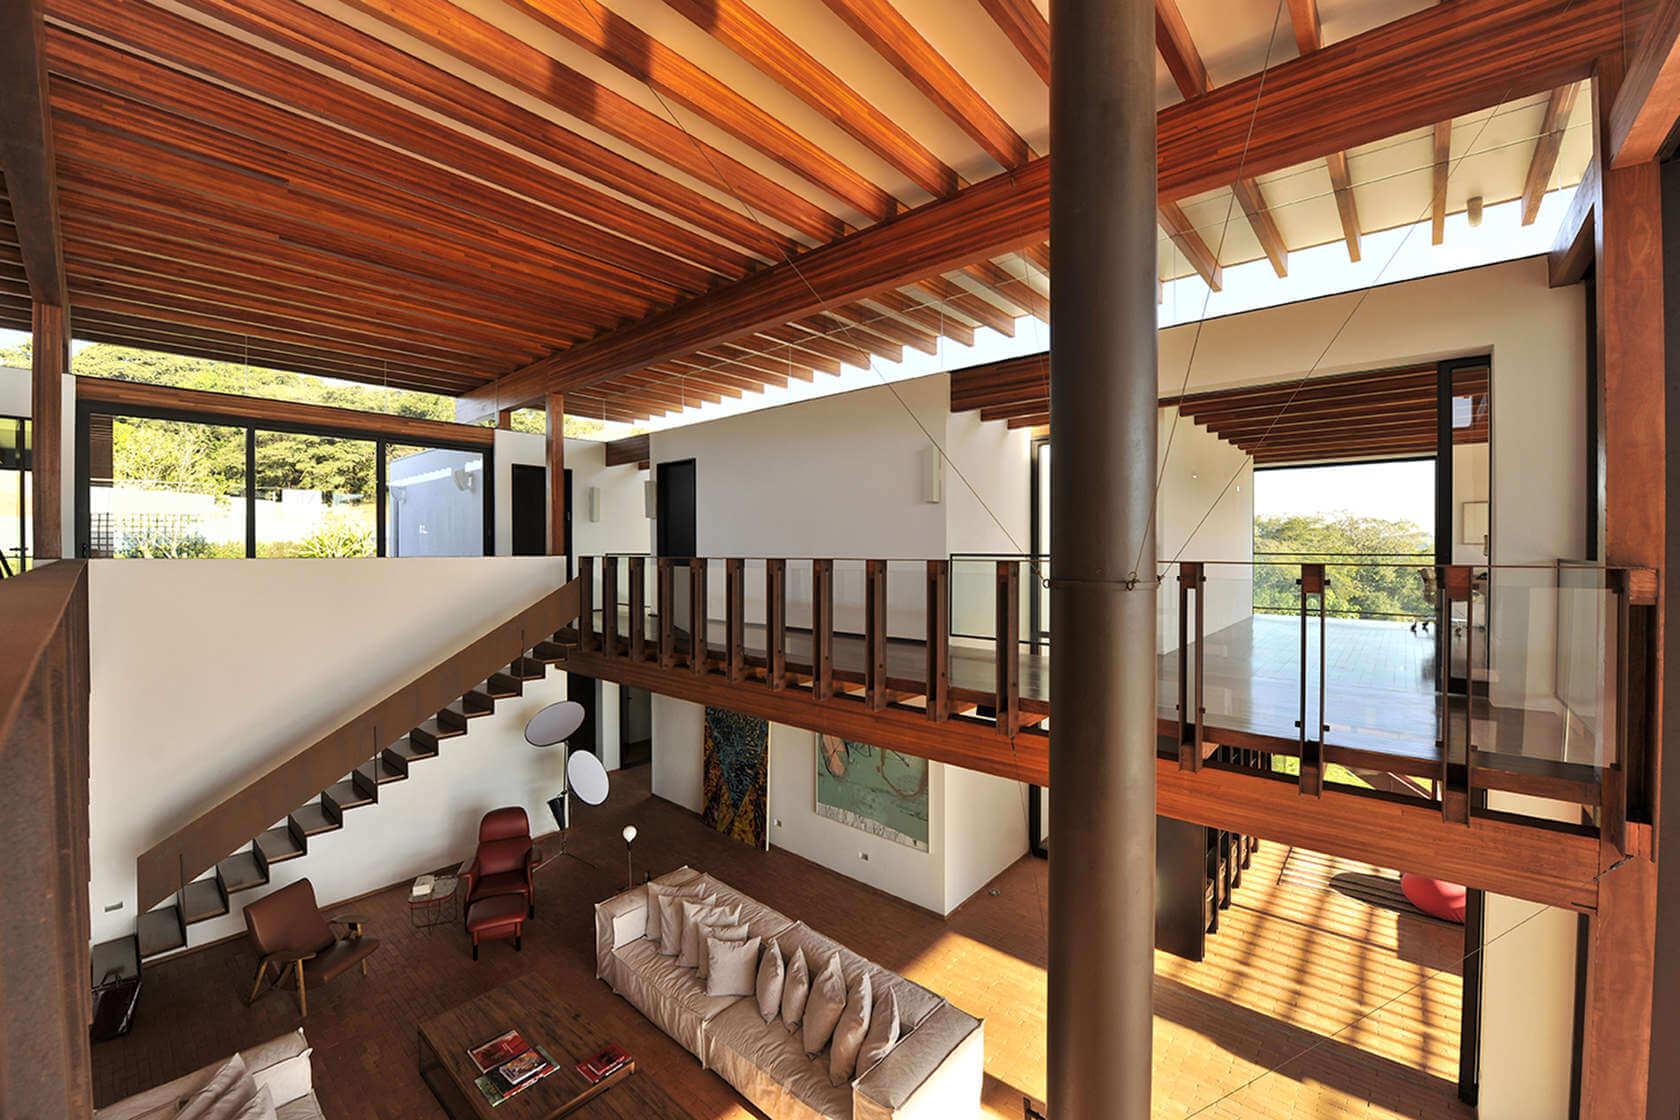 quinta-da-baroneza-candida-tabet-arquitetura-24